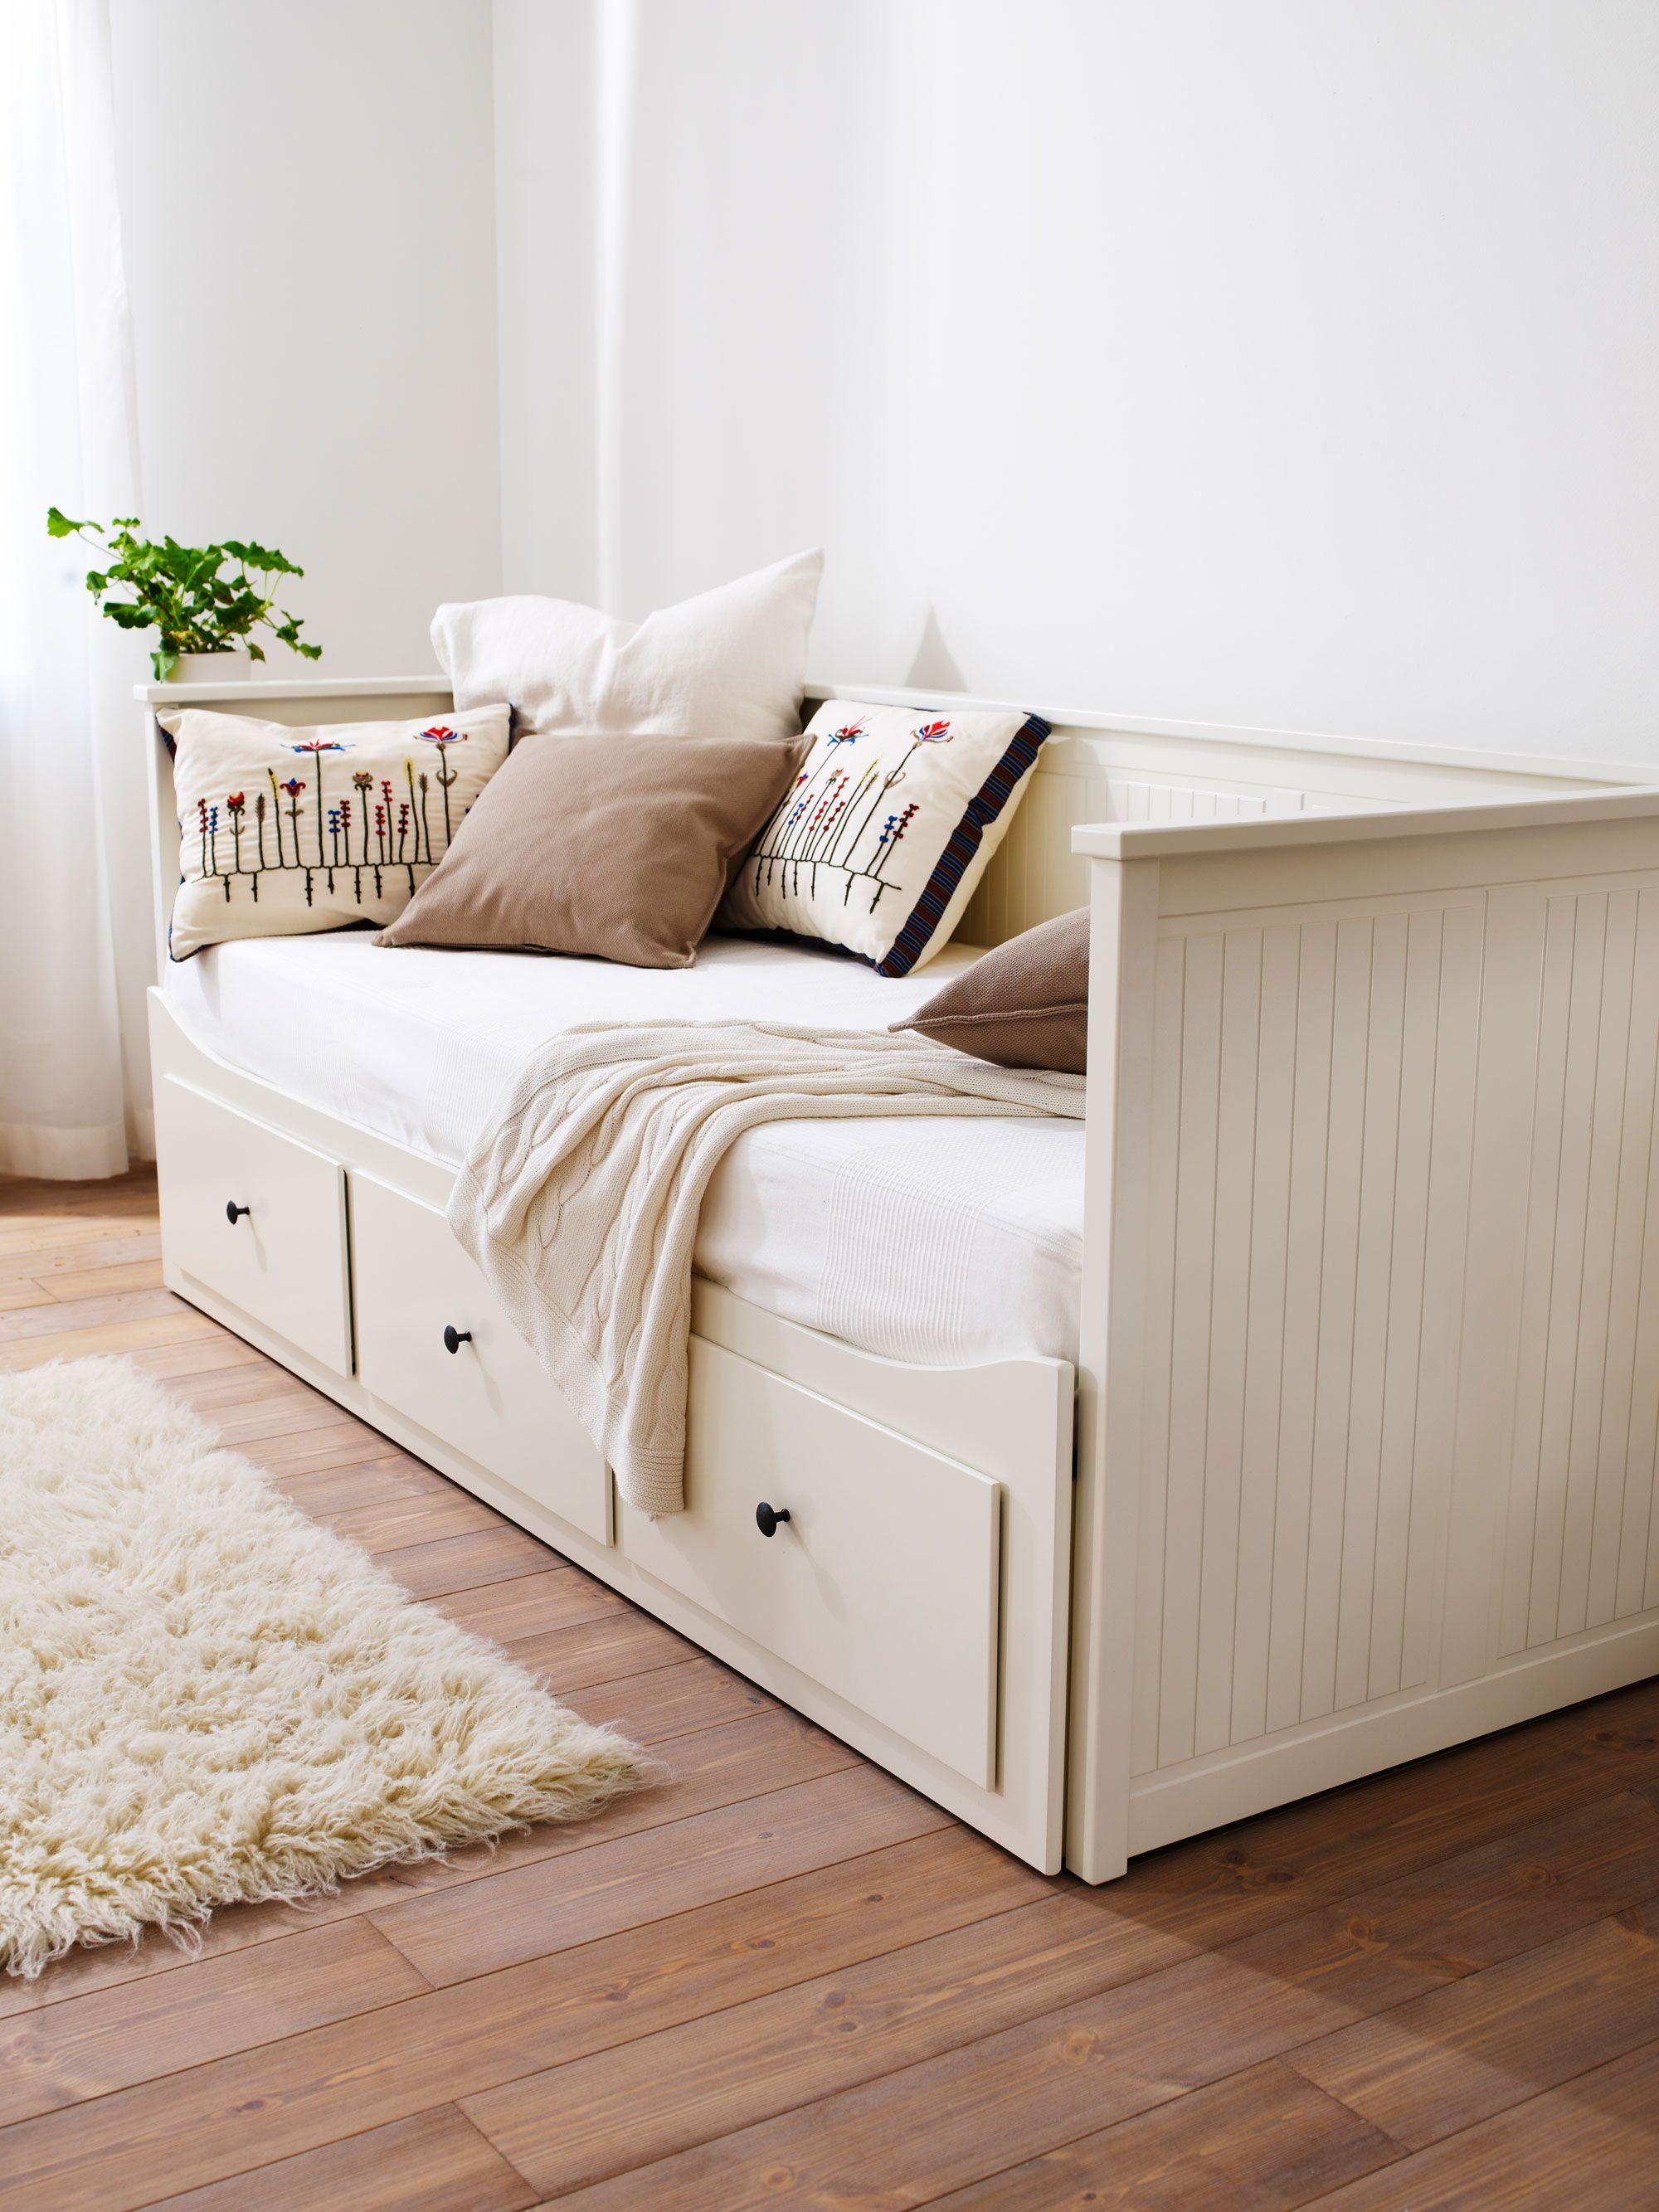 Simple Ikea Hemnes Bed Decoration Ideas